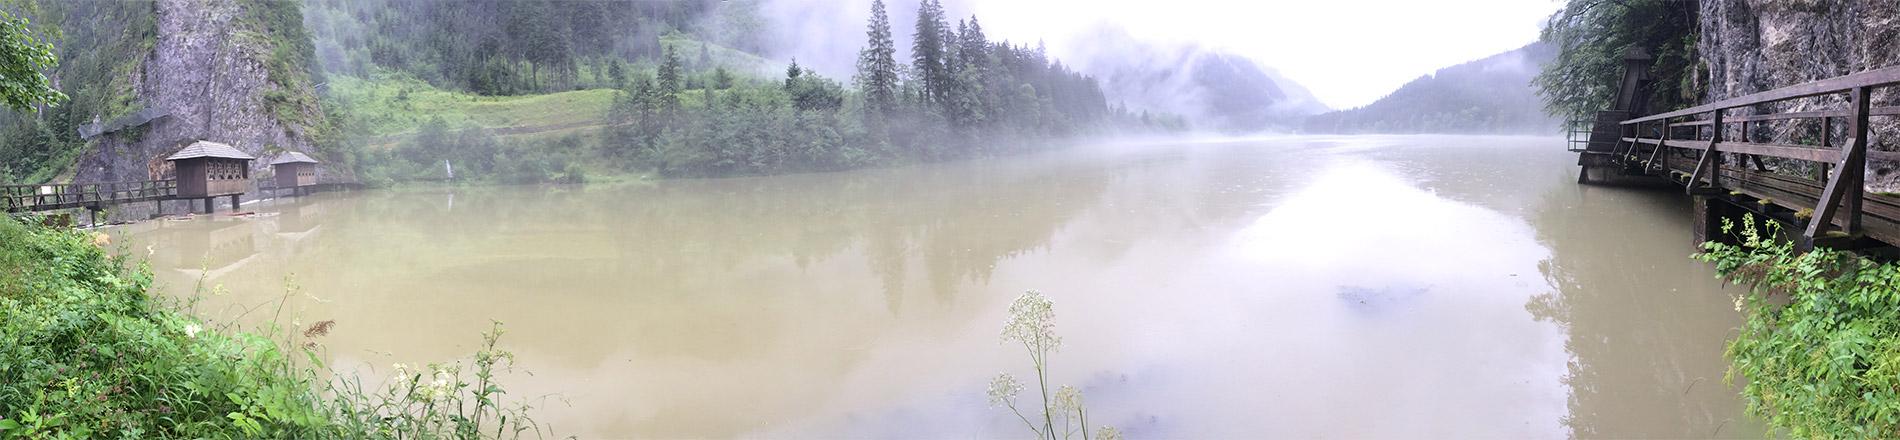 Prescenyklause Panorama